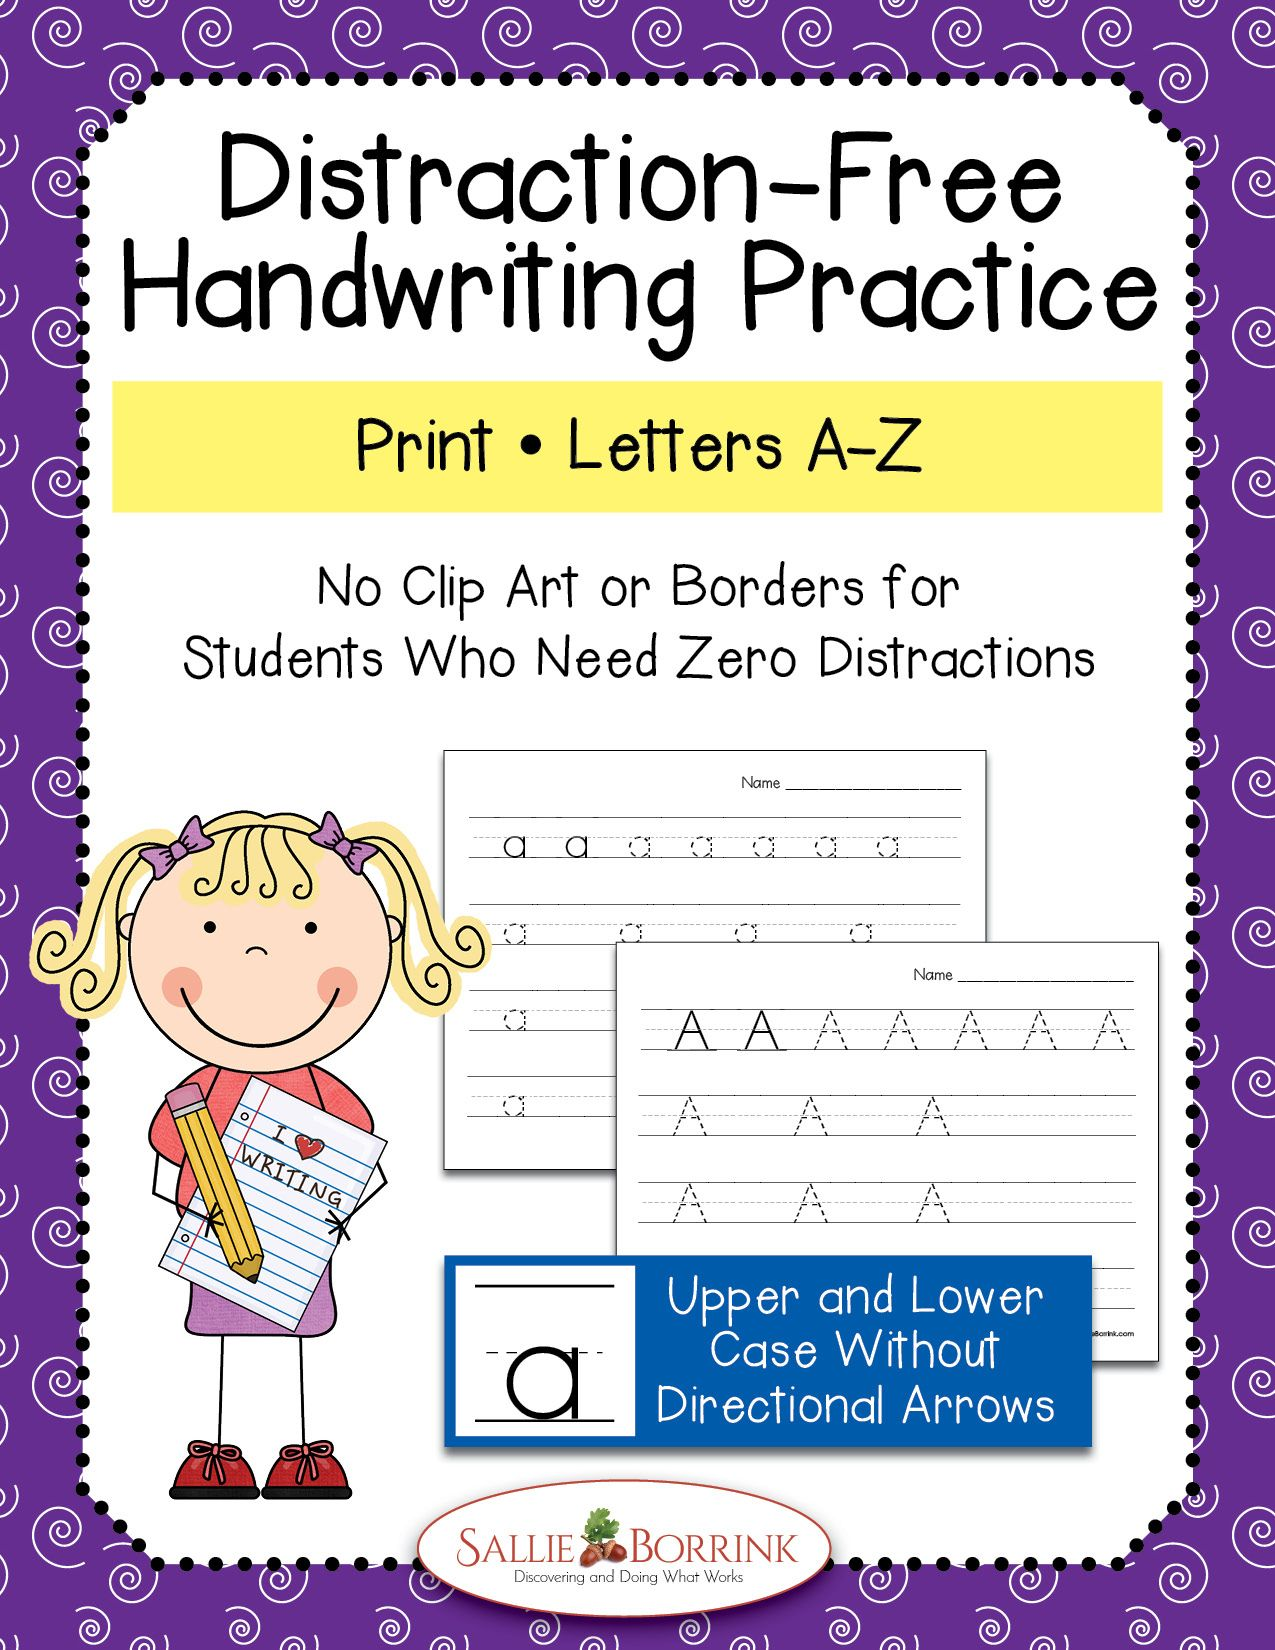 Distraction Free Print Handwriting Practice